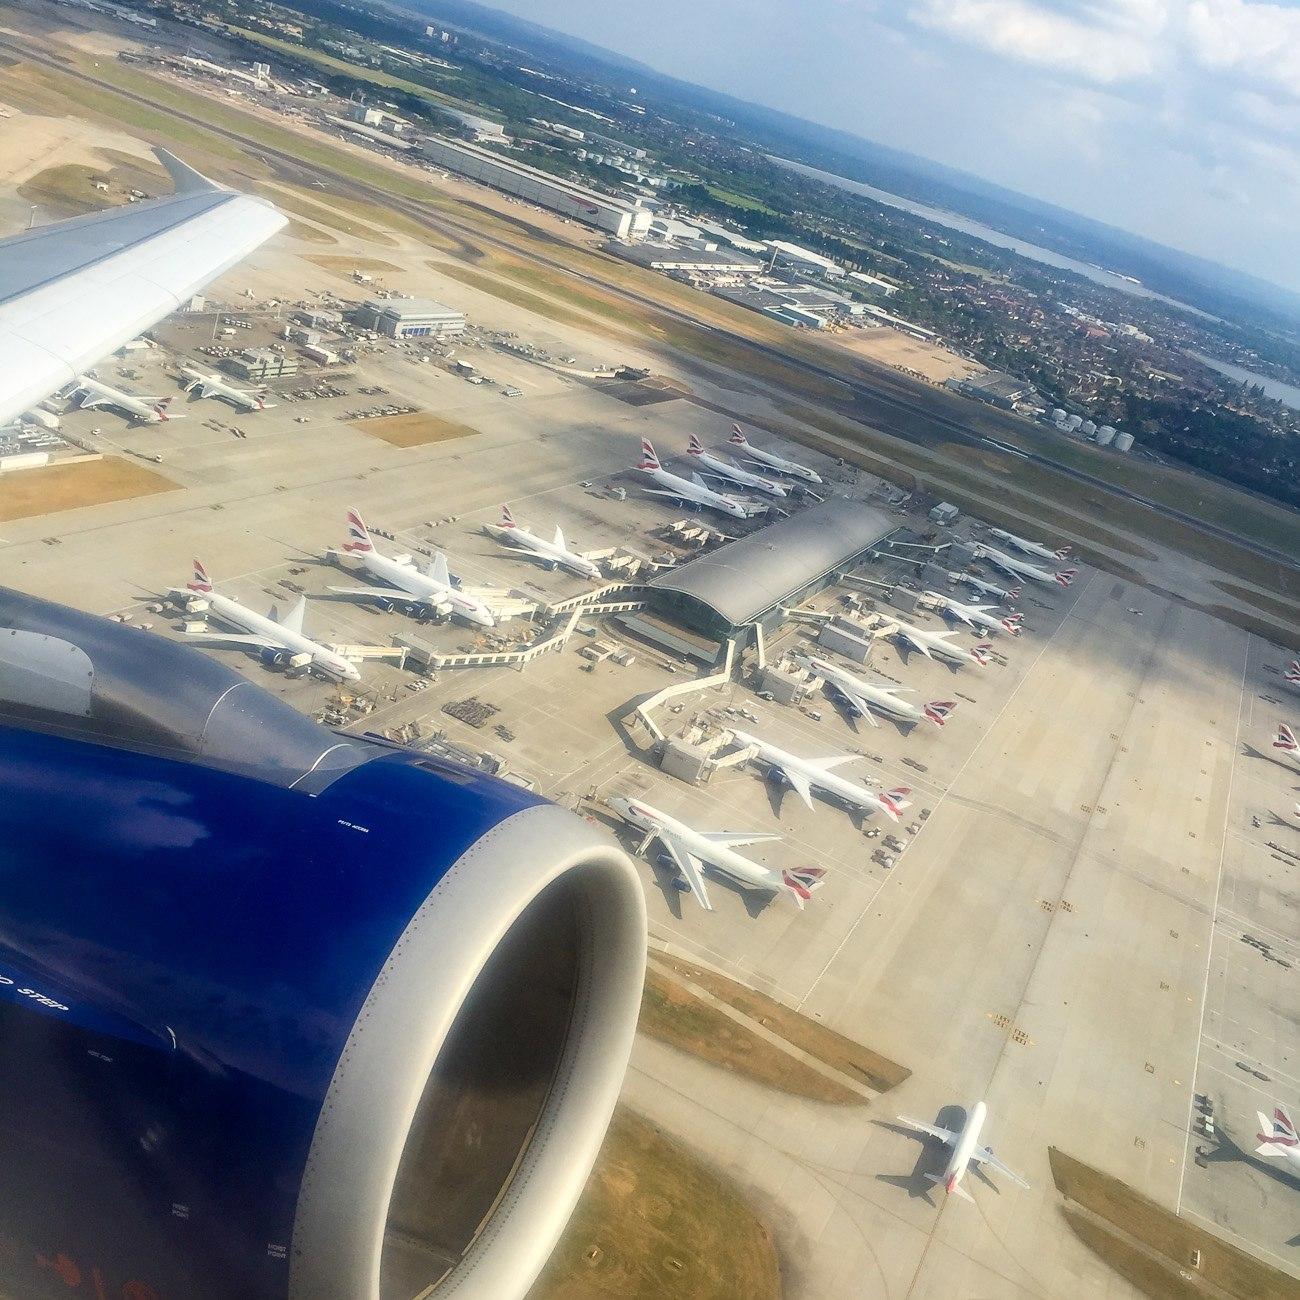 A British Airways flight to Paris on take-off from Heathrow Airport